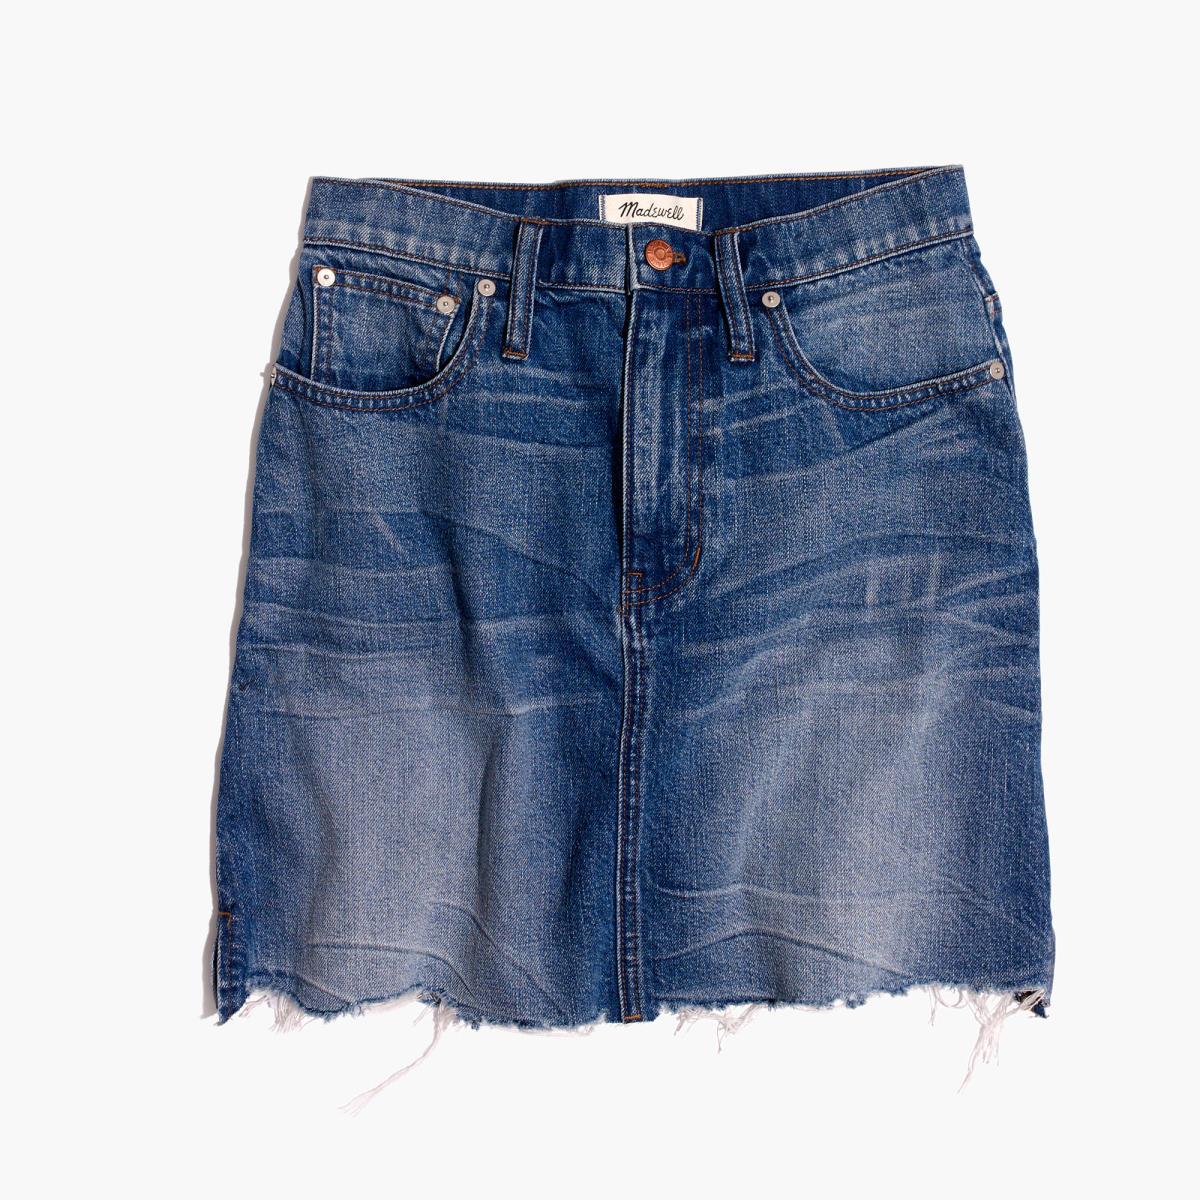 Madewell McCarren raw-hem jean skirt, $79.50, available at Madewell.